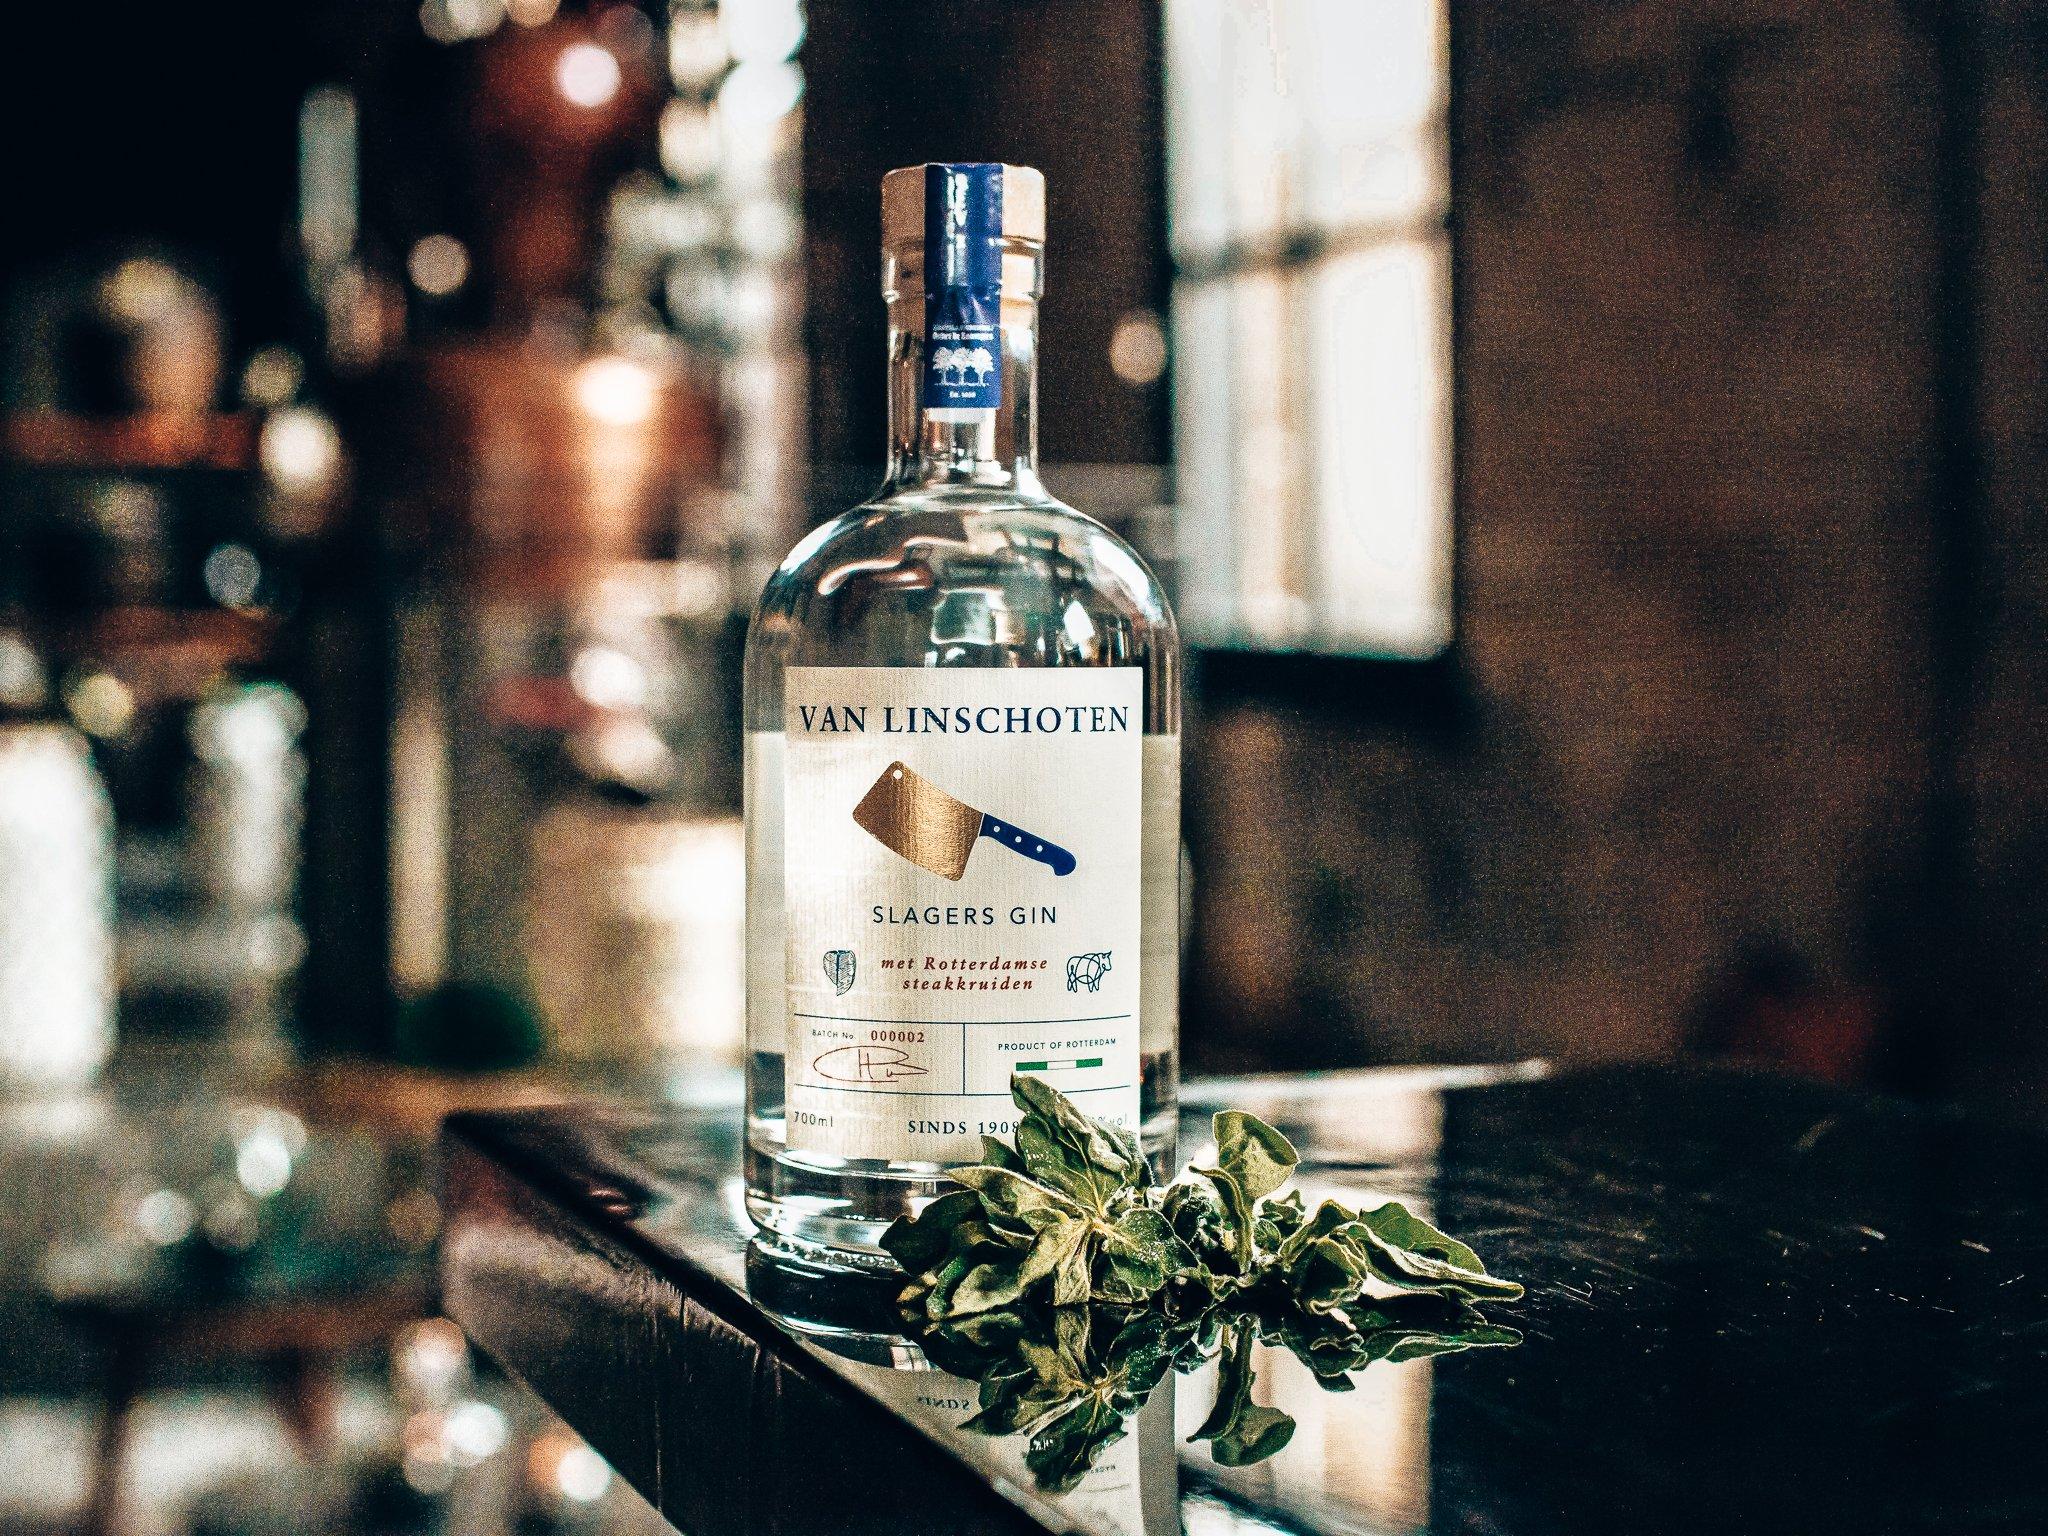 Slagers Gin uit Rotterdam uitgelicht, Alles over gin.,